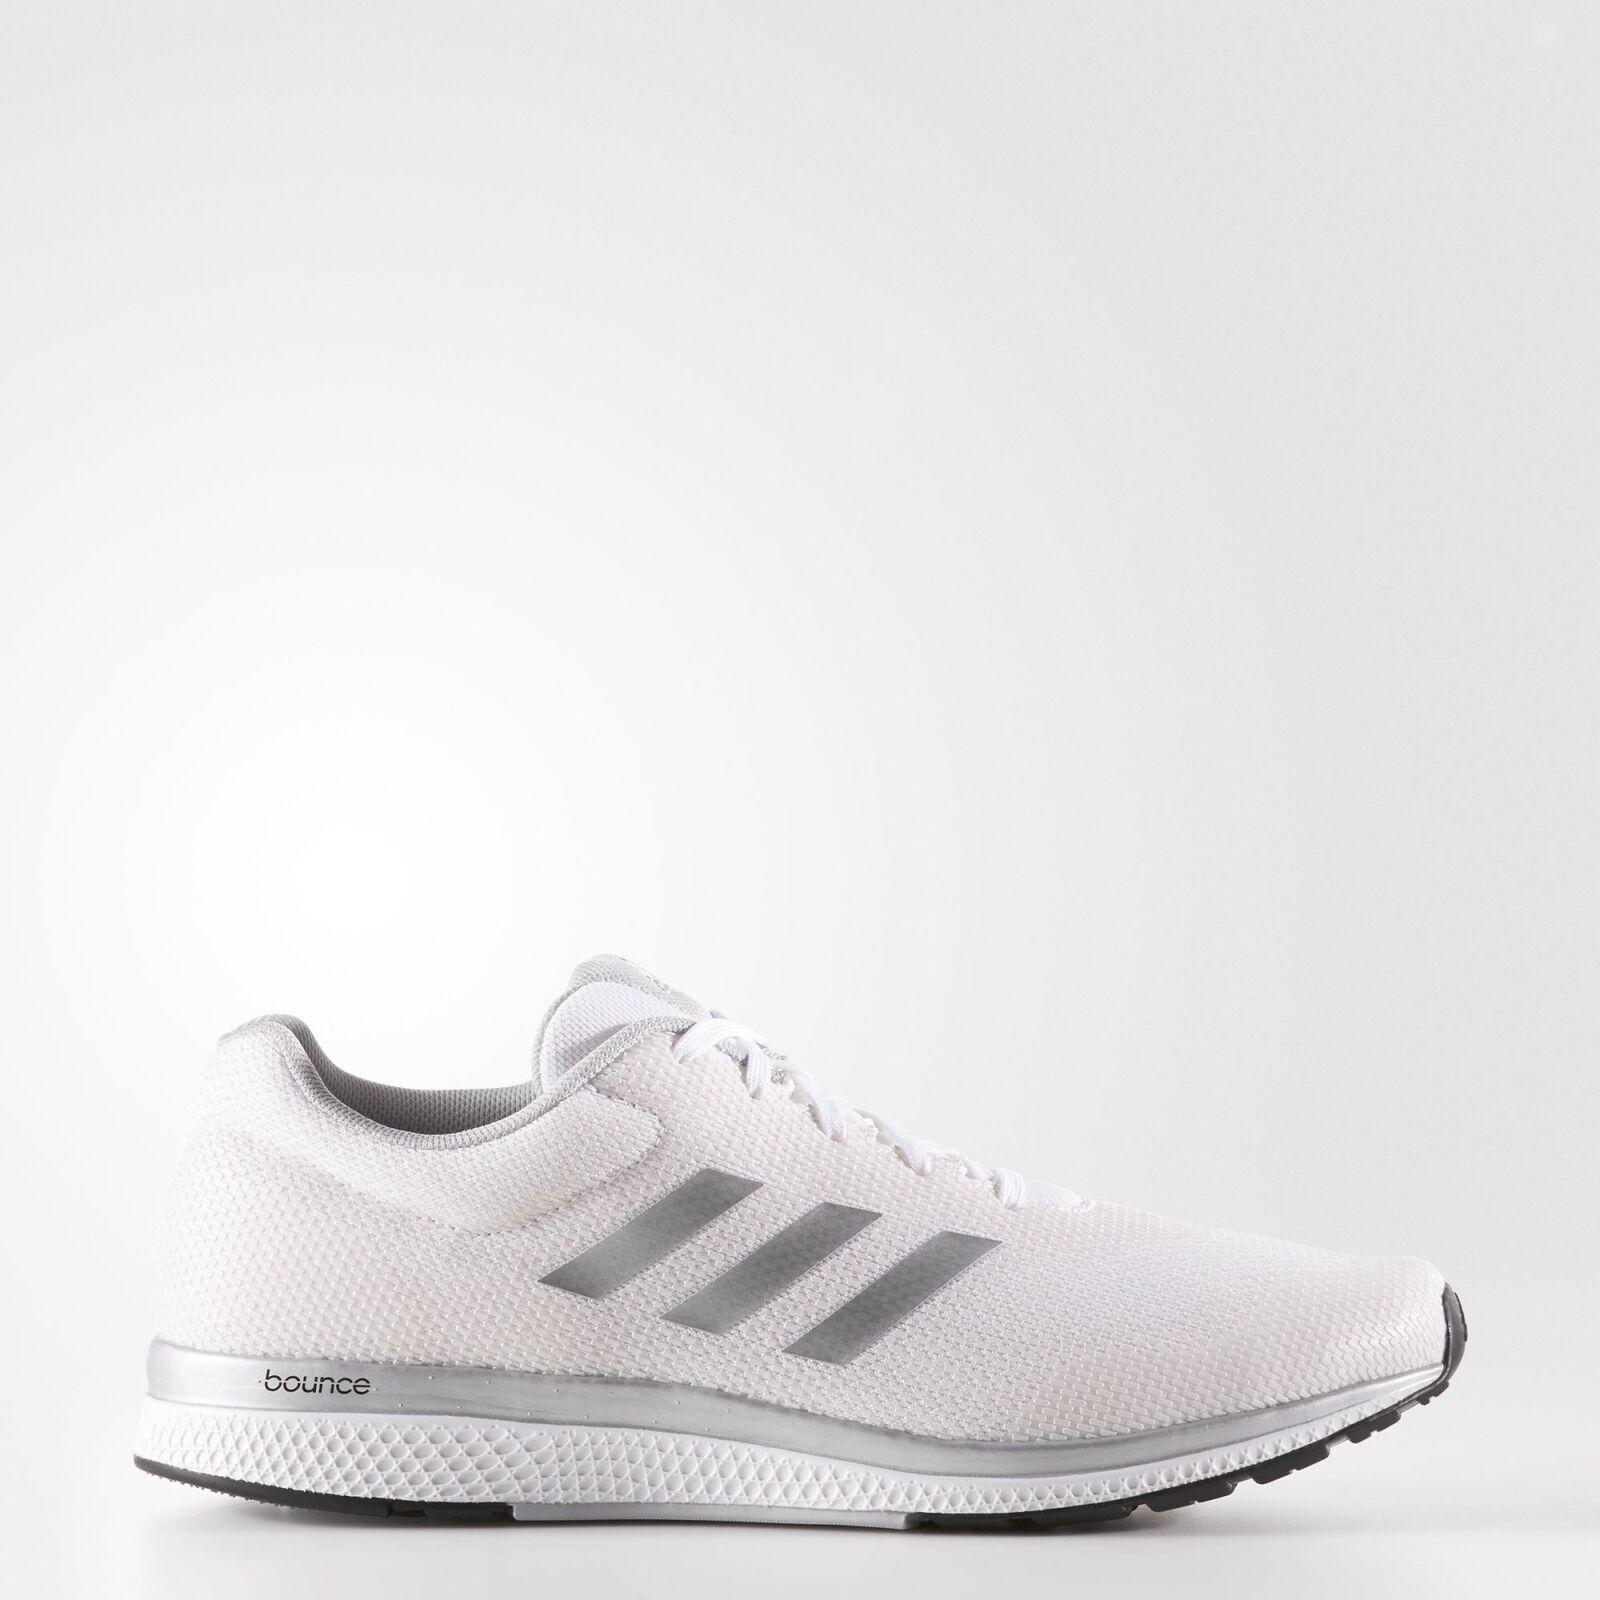 Adidas Mana Bounce 2 M Aramis [BW0564] Herren Laufschuhe Weiß / Silber-Onix